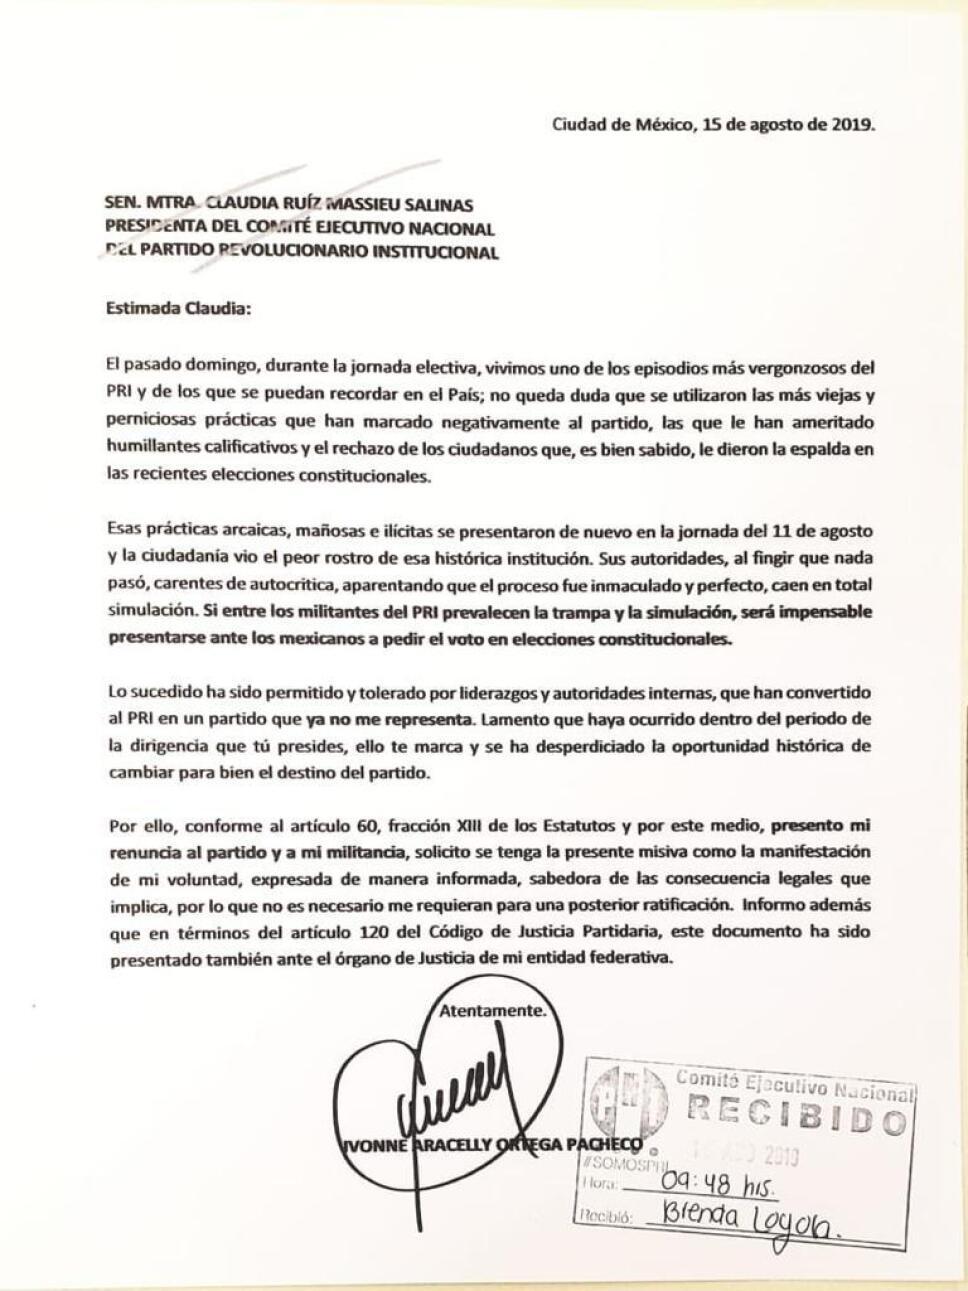 Carta de Renuncia Ortega